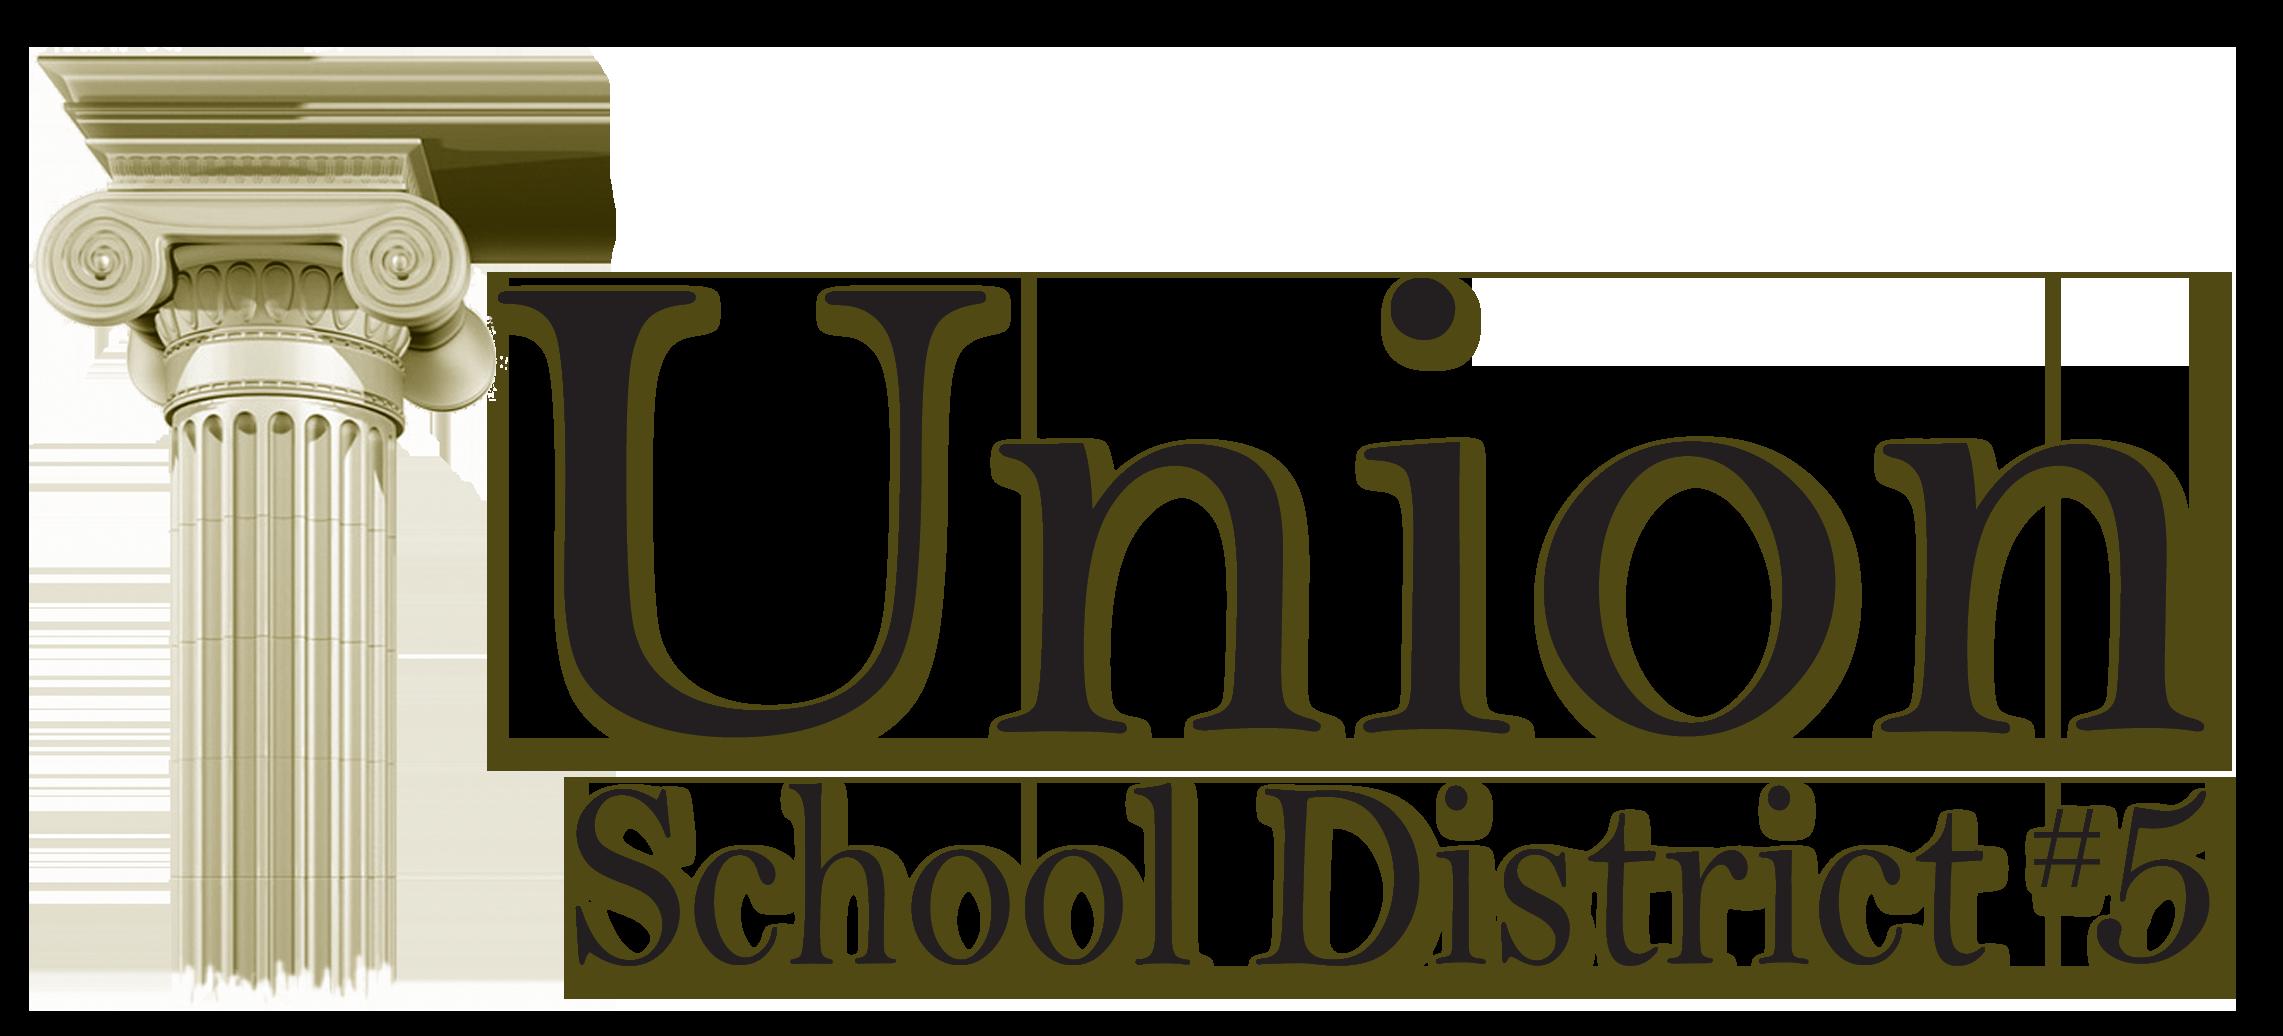 Union School District